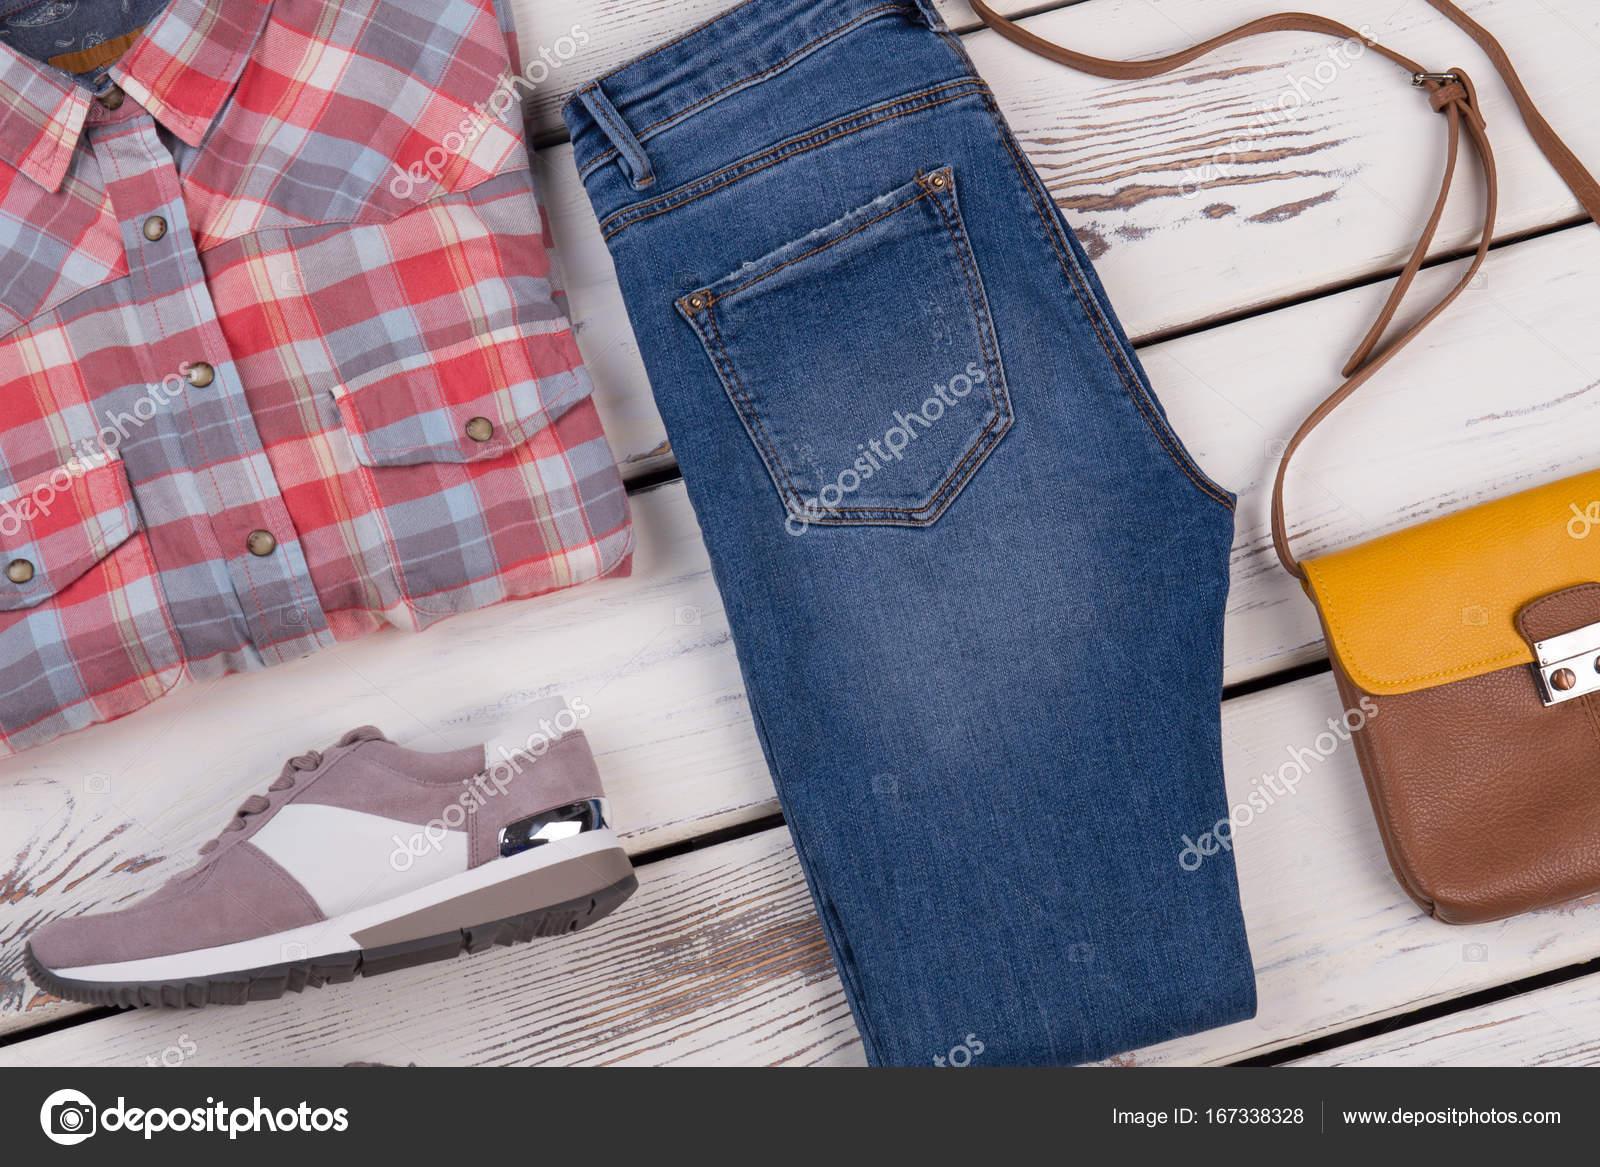 Hosen Hemd Jeans Hemd Flanell Und Flanell 45AR3jL